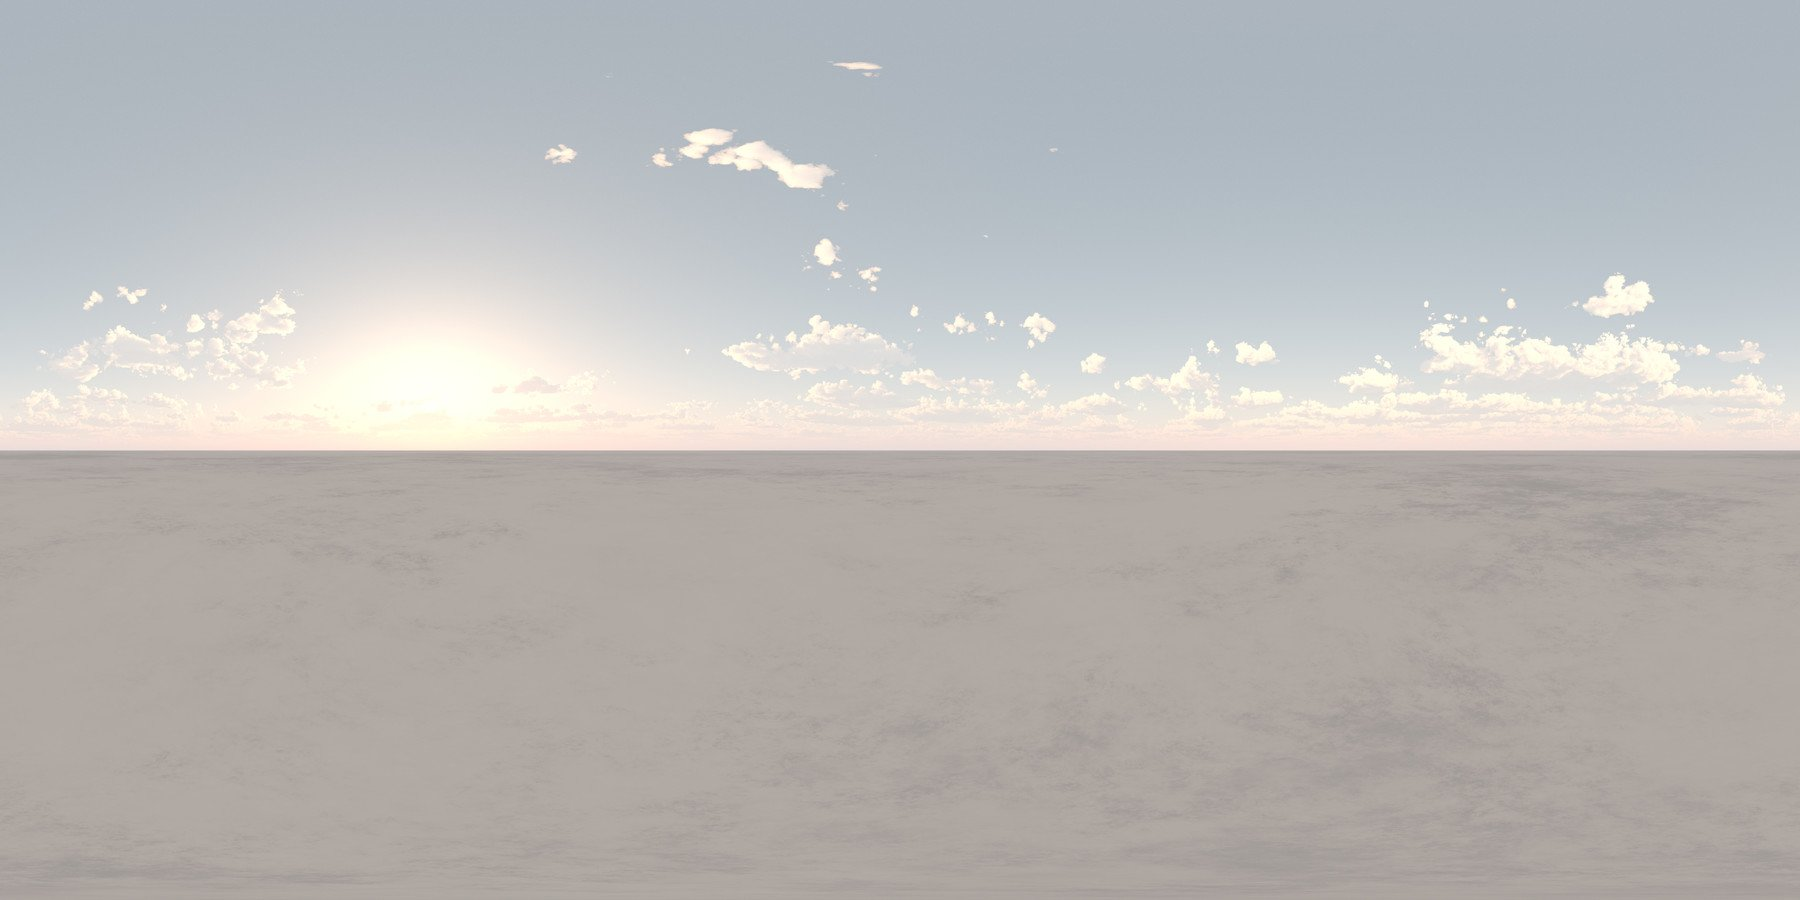 Sky HDRi Evening 001 by Valmik Shah